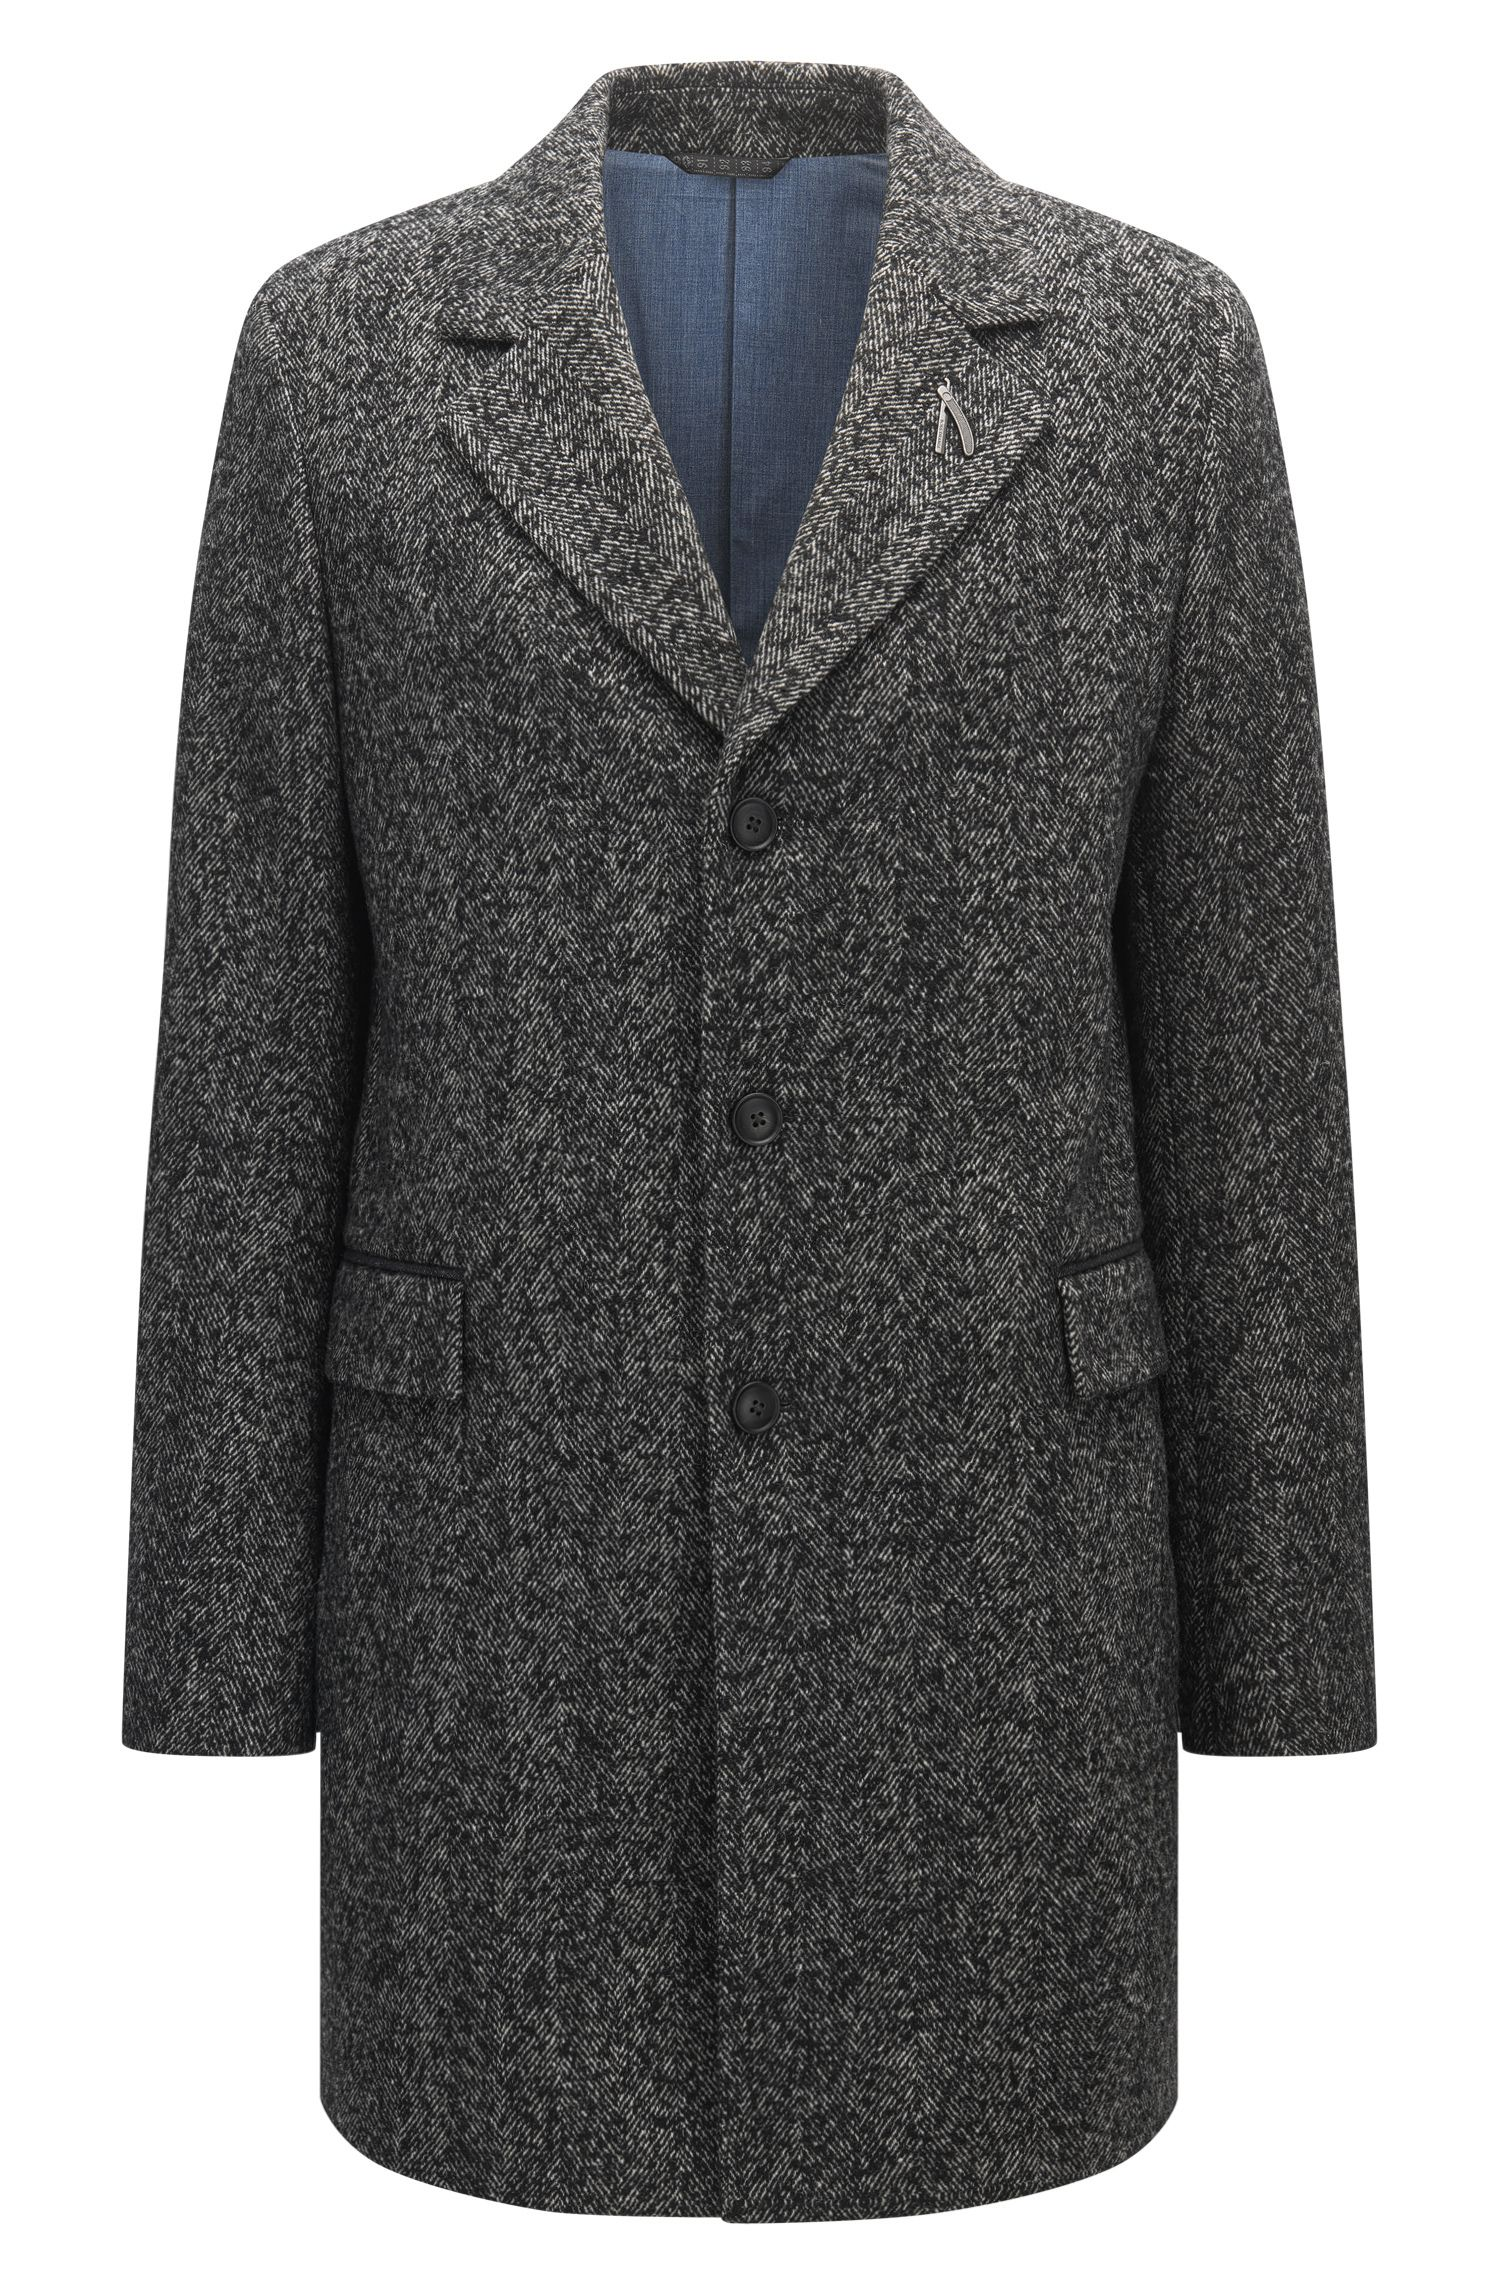 Herringbone coat in a slim fit